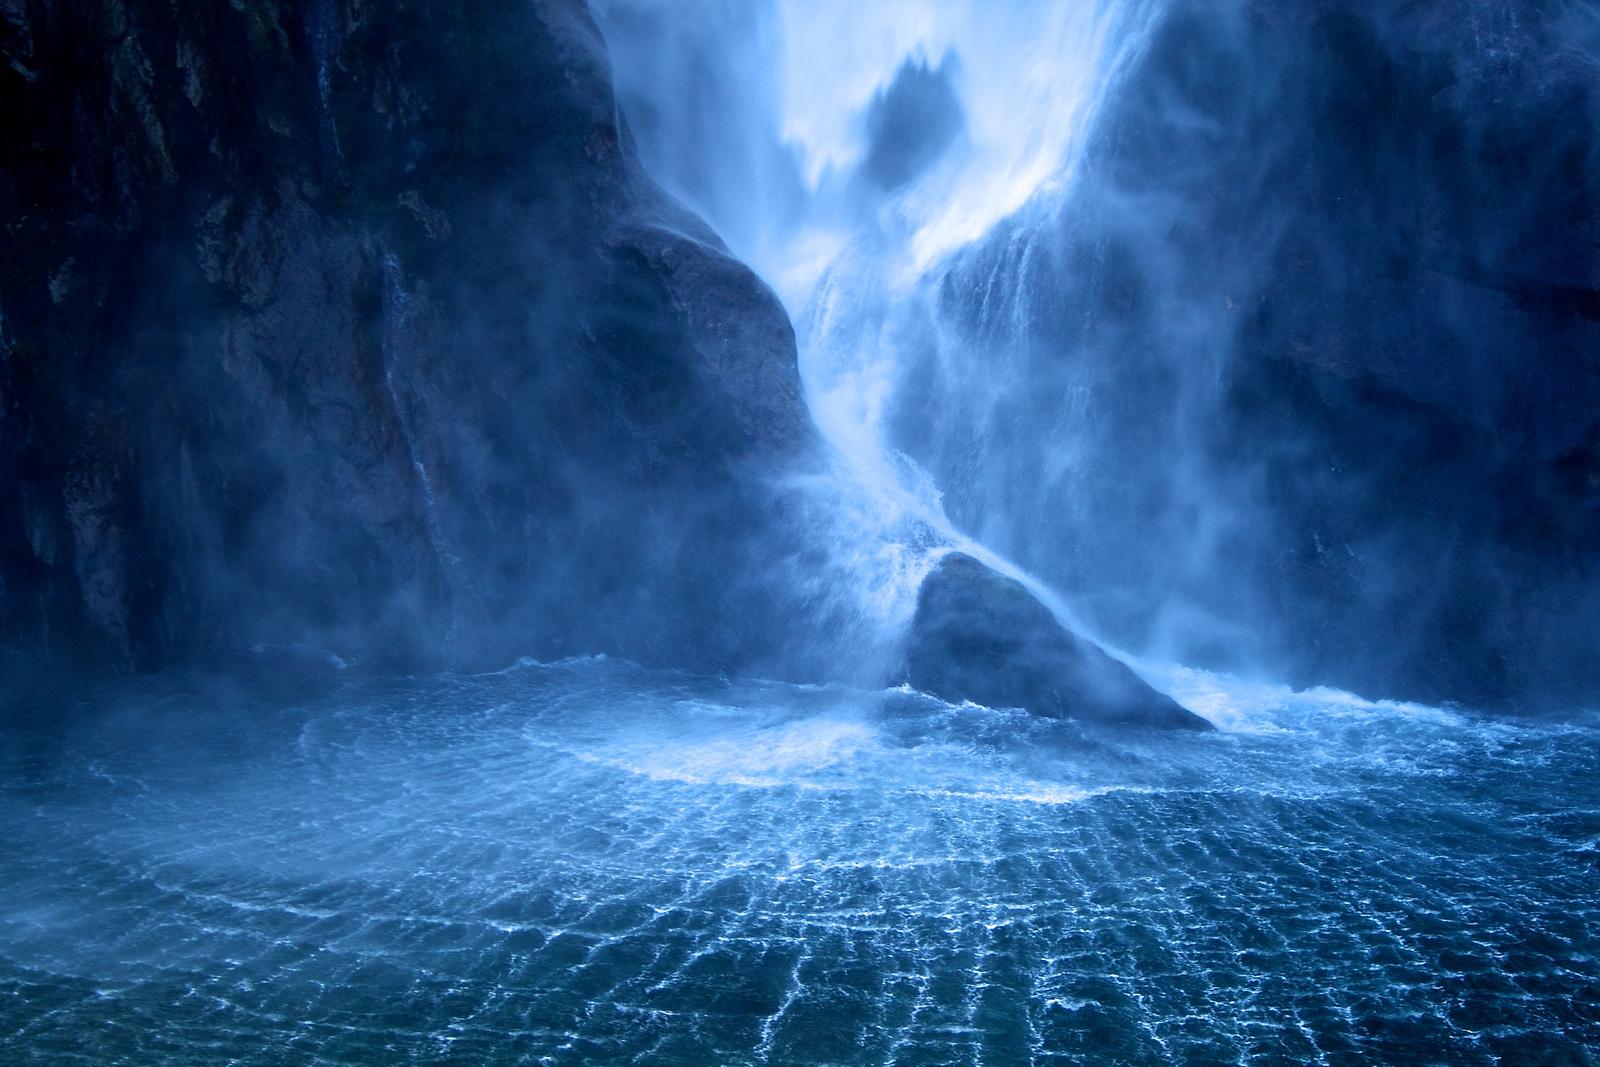 Cool water backgrounds wallpapersafari - Water wallpaper hd download ...